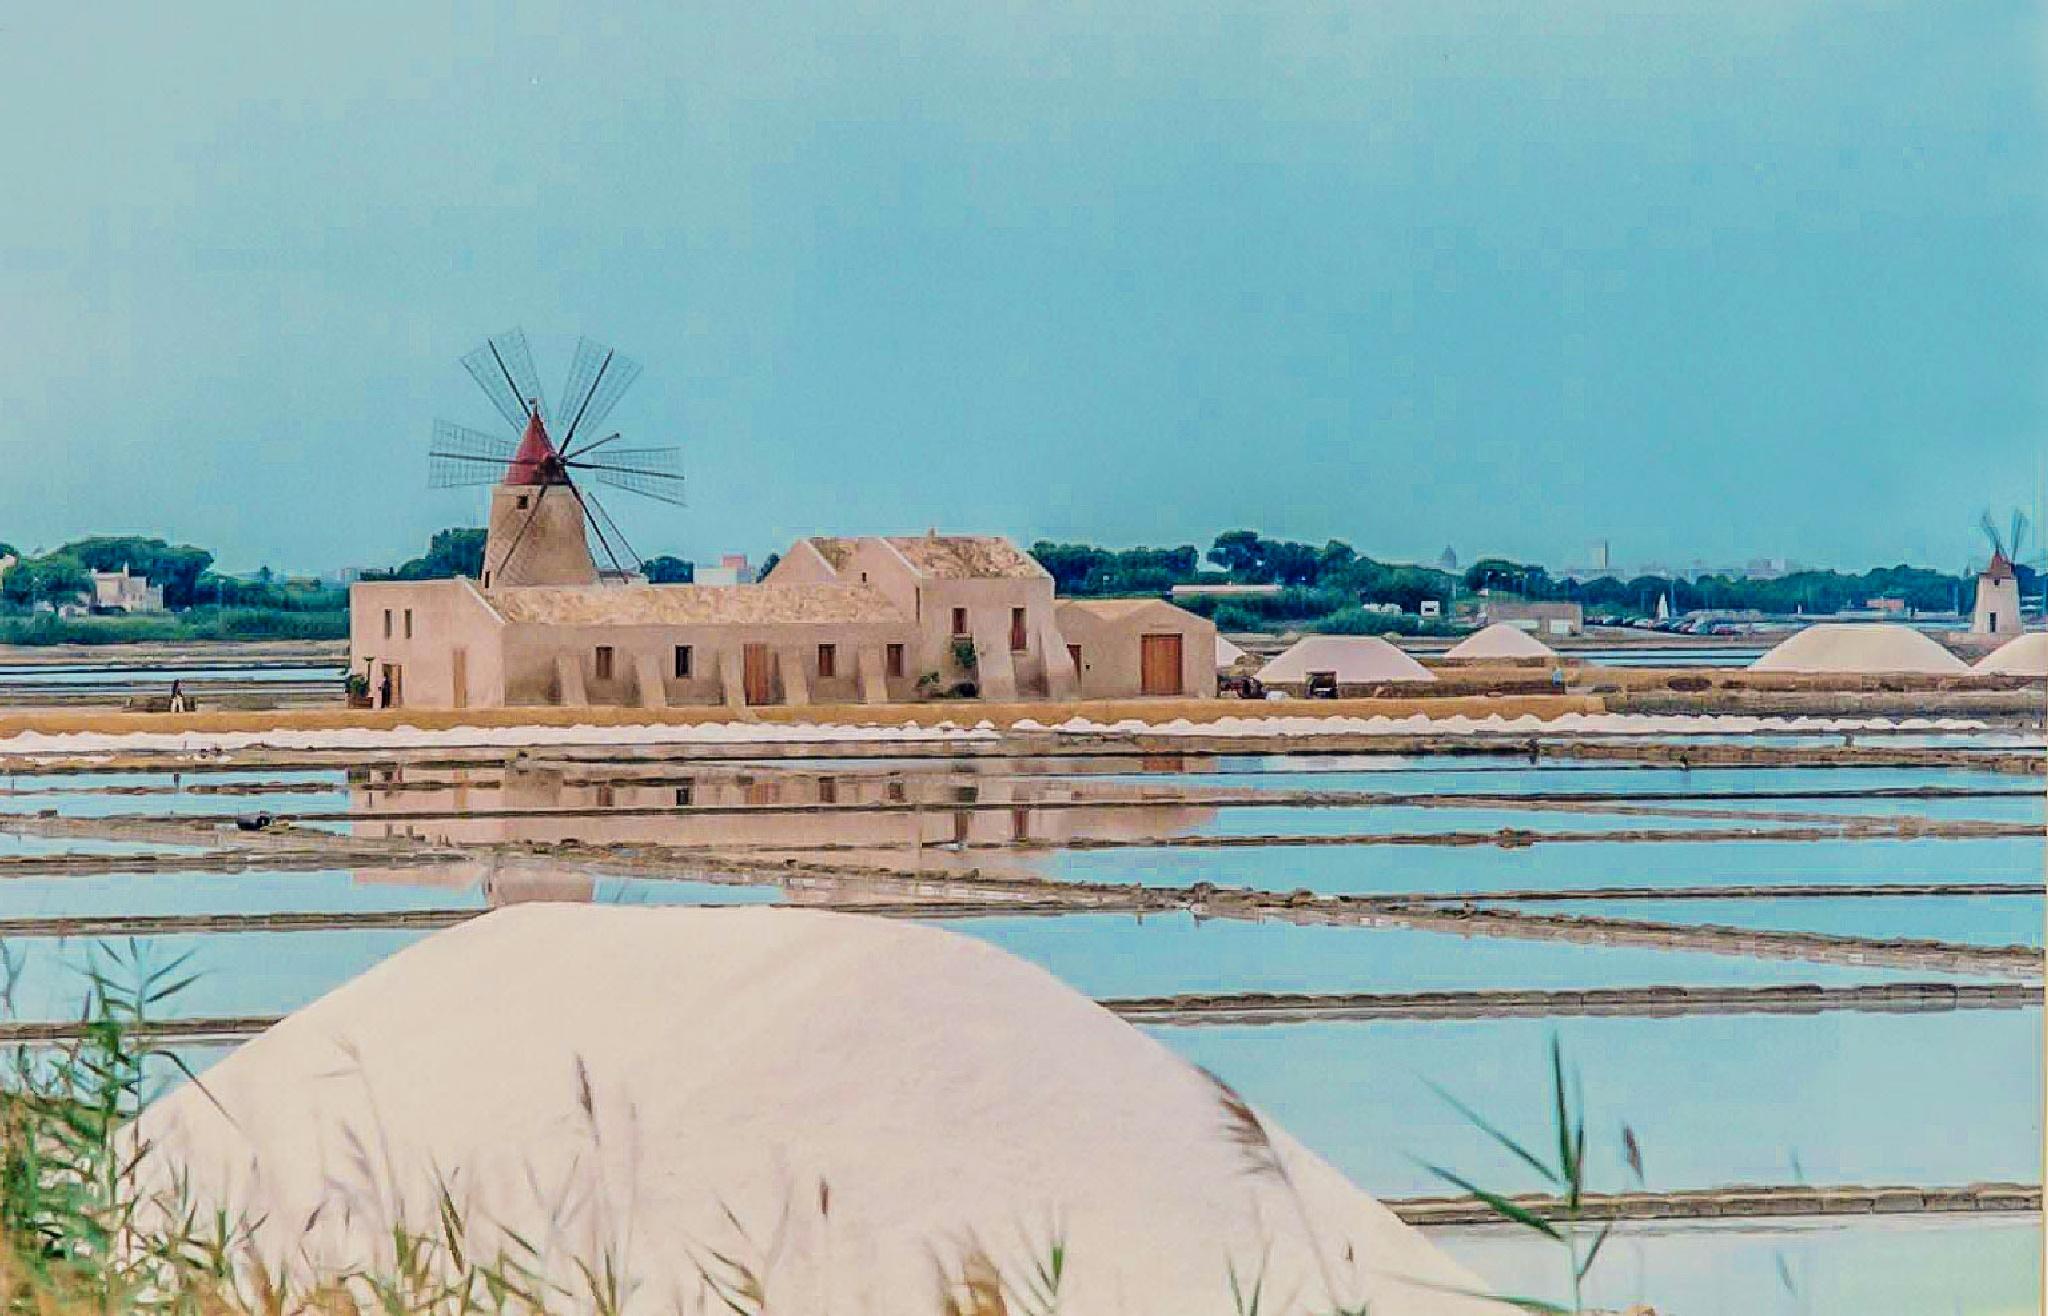 salt flats by gaetano.pistoia.14